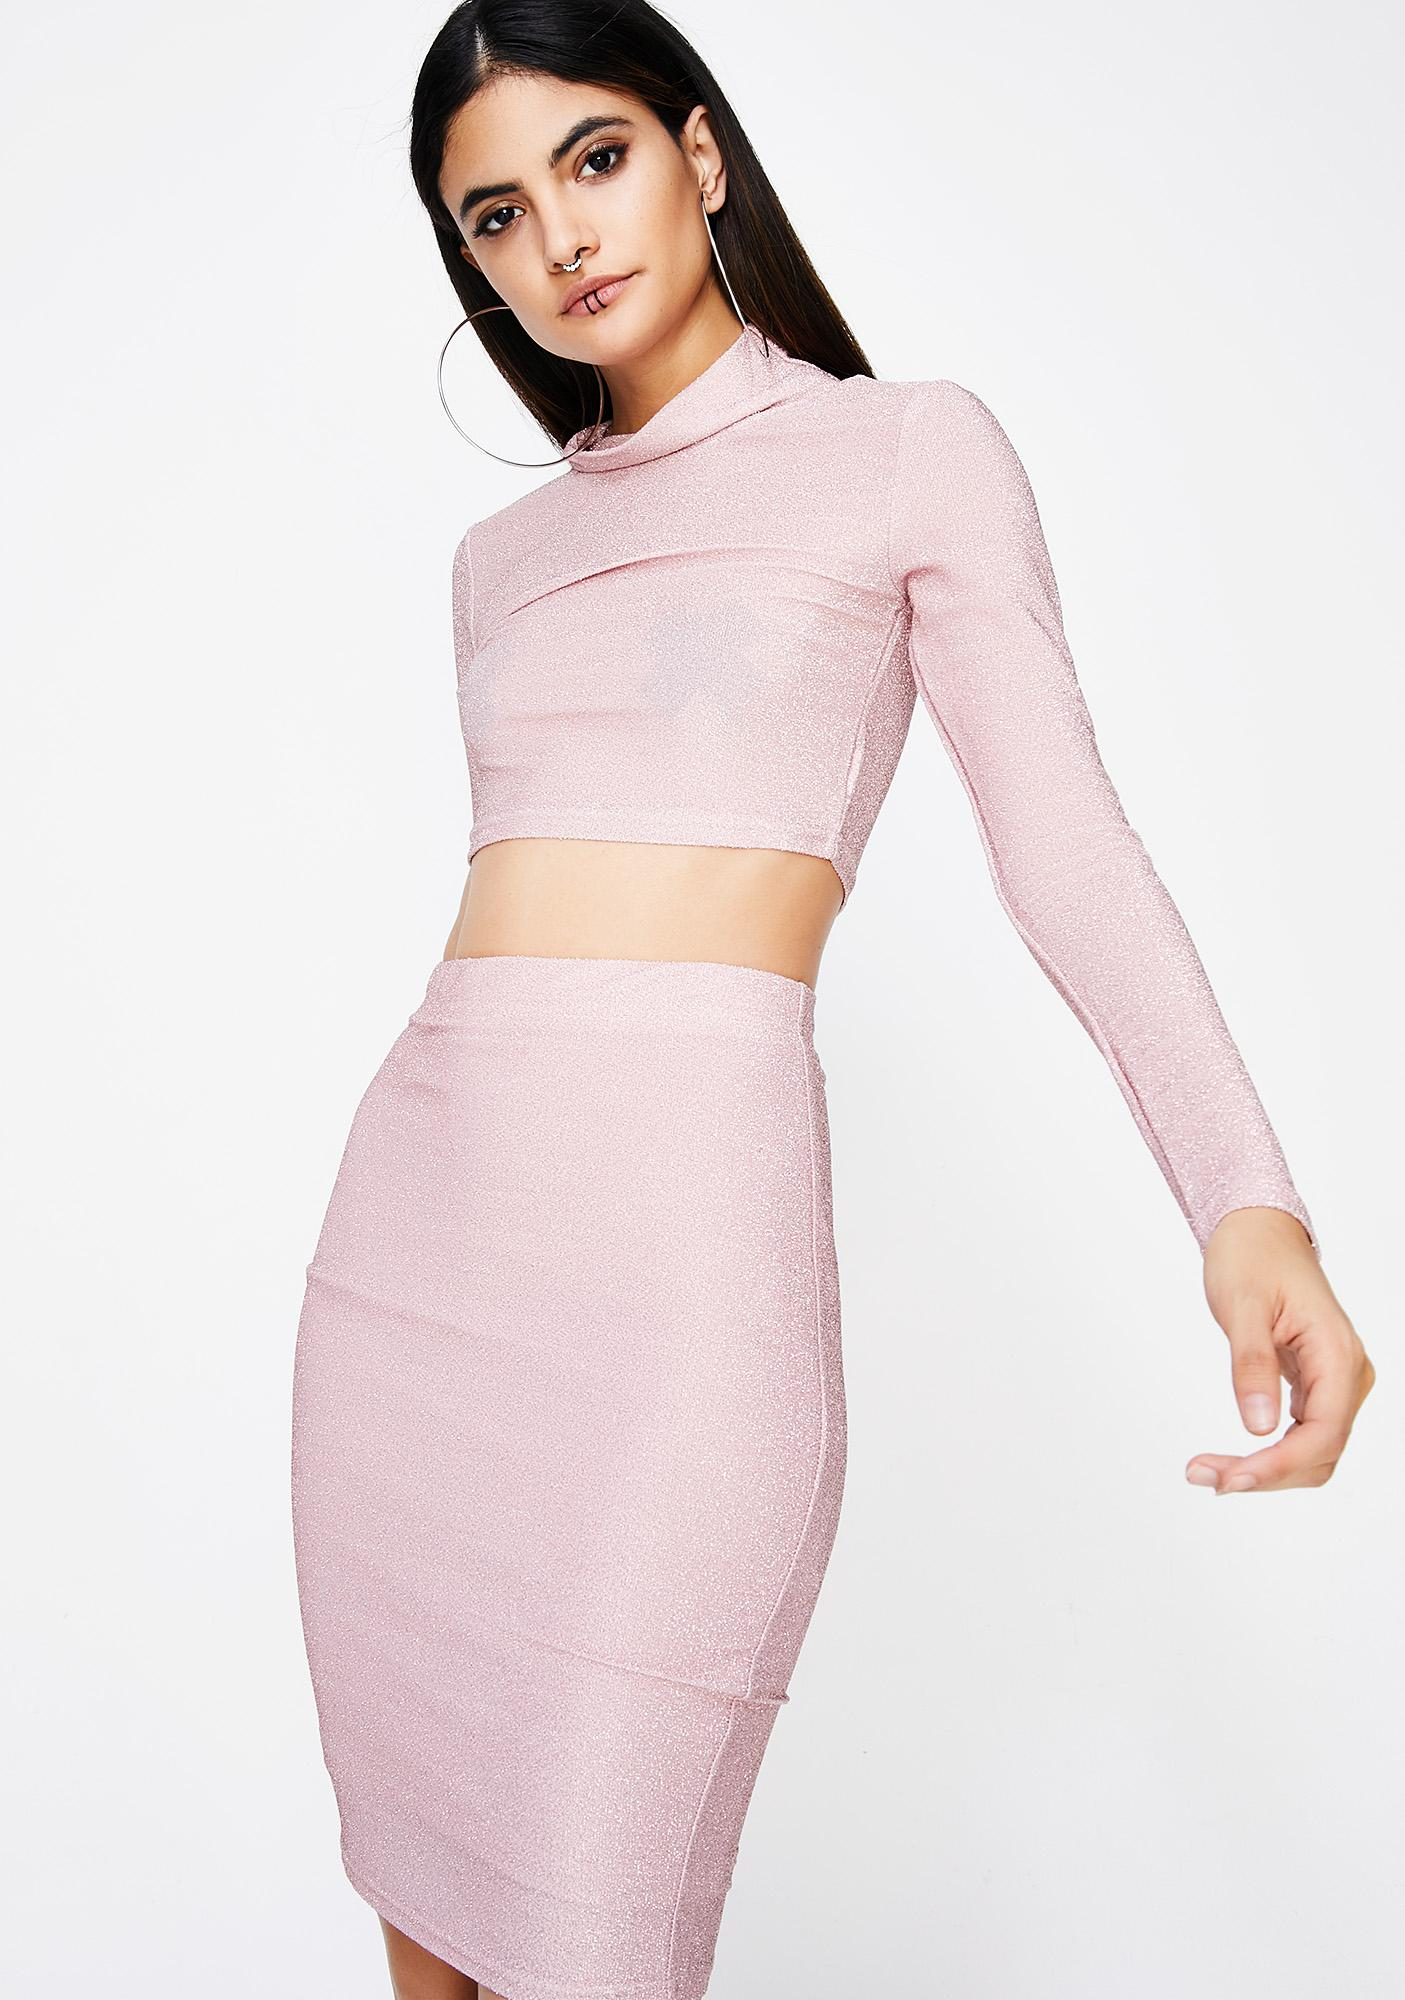 Haven Lane Sparkle Skirt